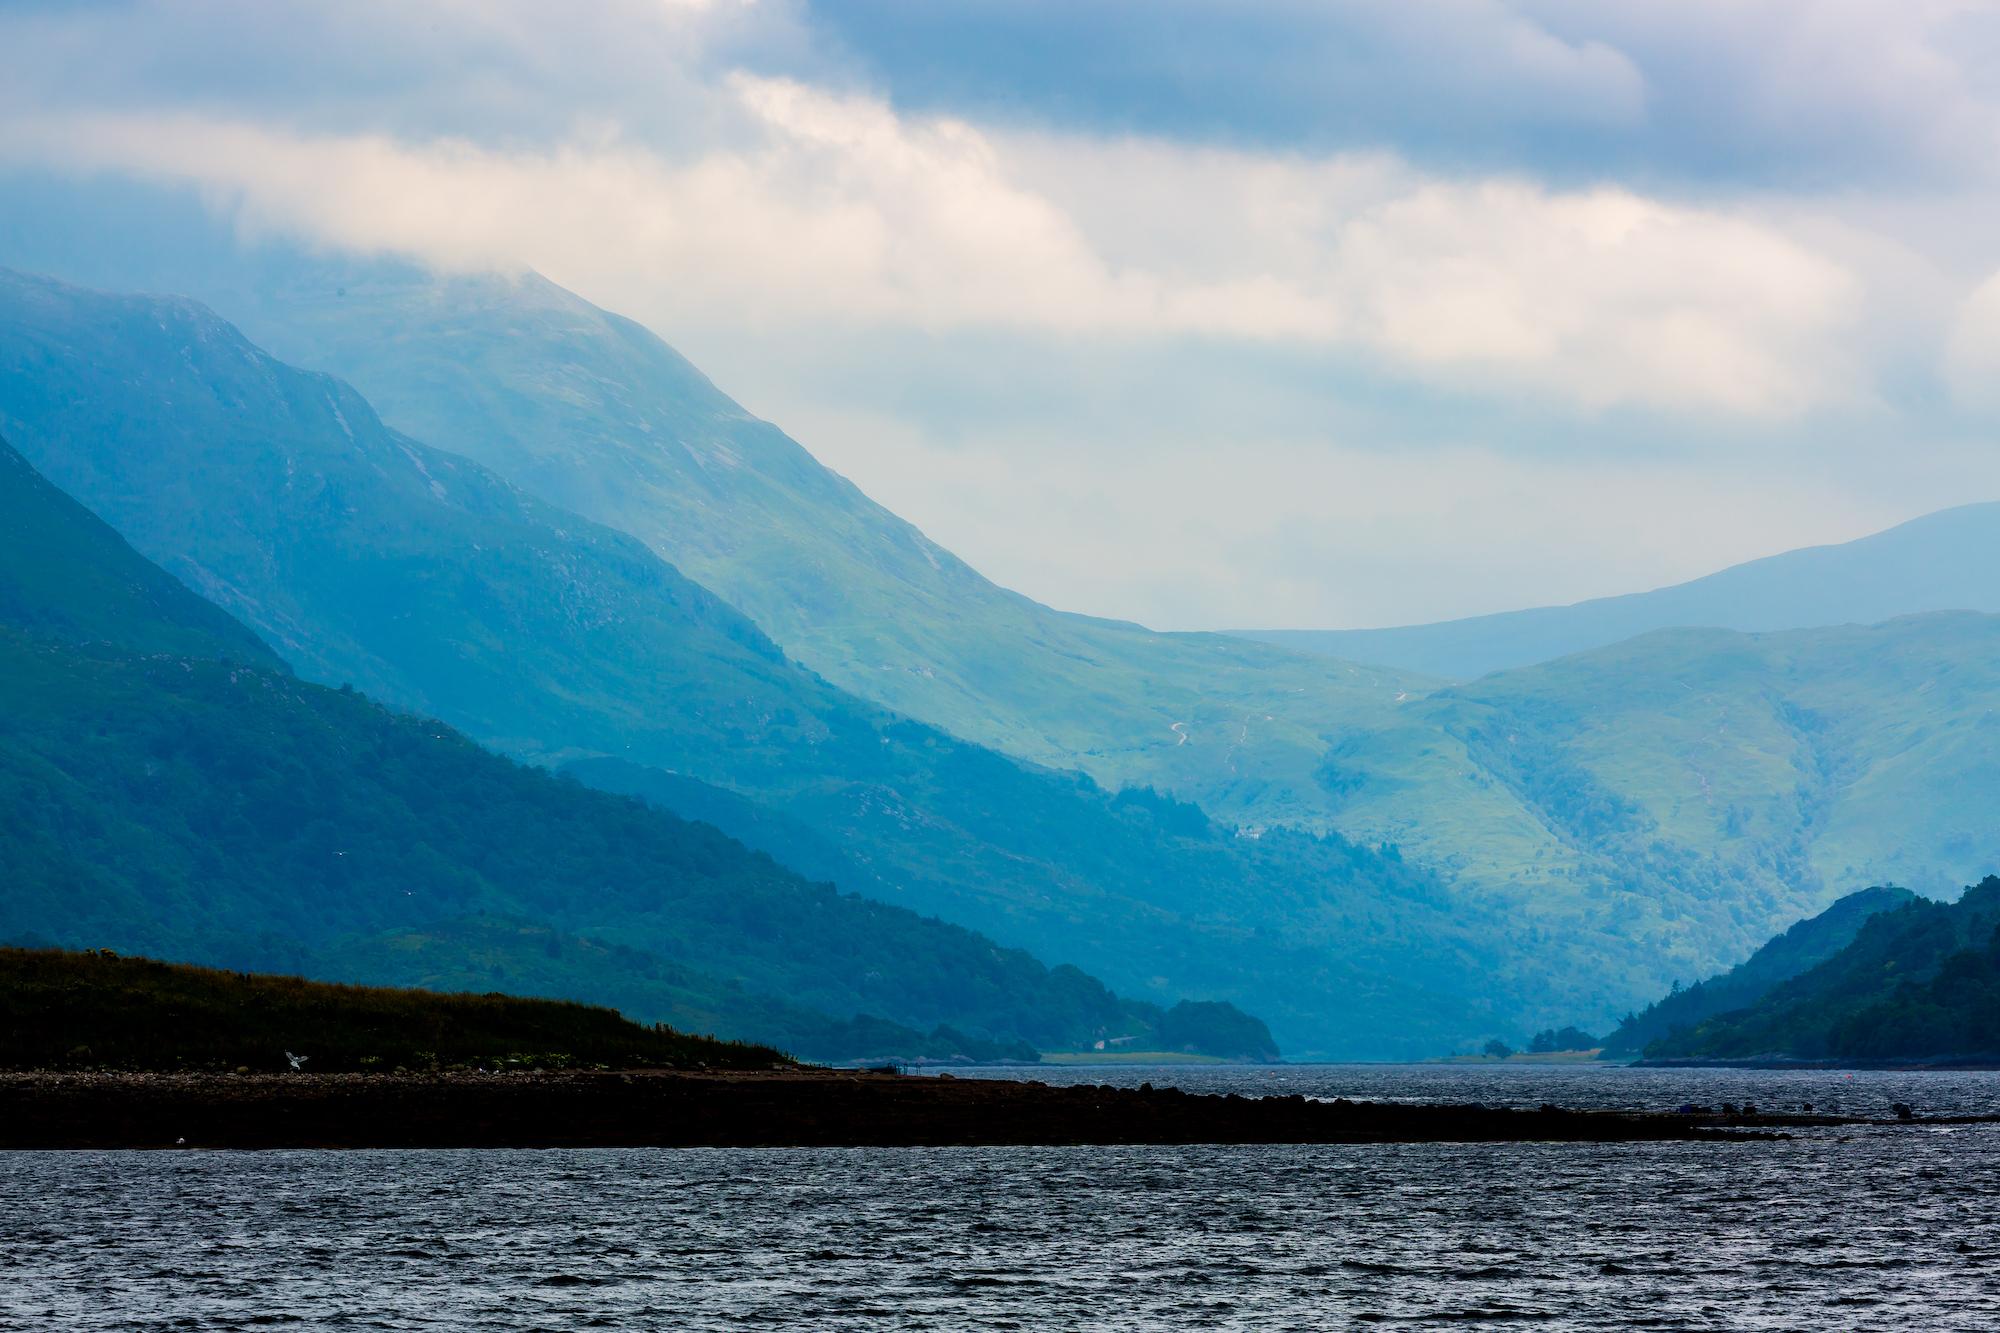 (698) Loch Leven, Mam na Gualainn, Beinn na Caillich, Glencoe, Lochaber, Scottish Highlands, Scotland.jpg